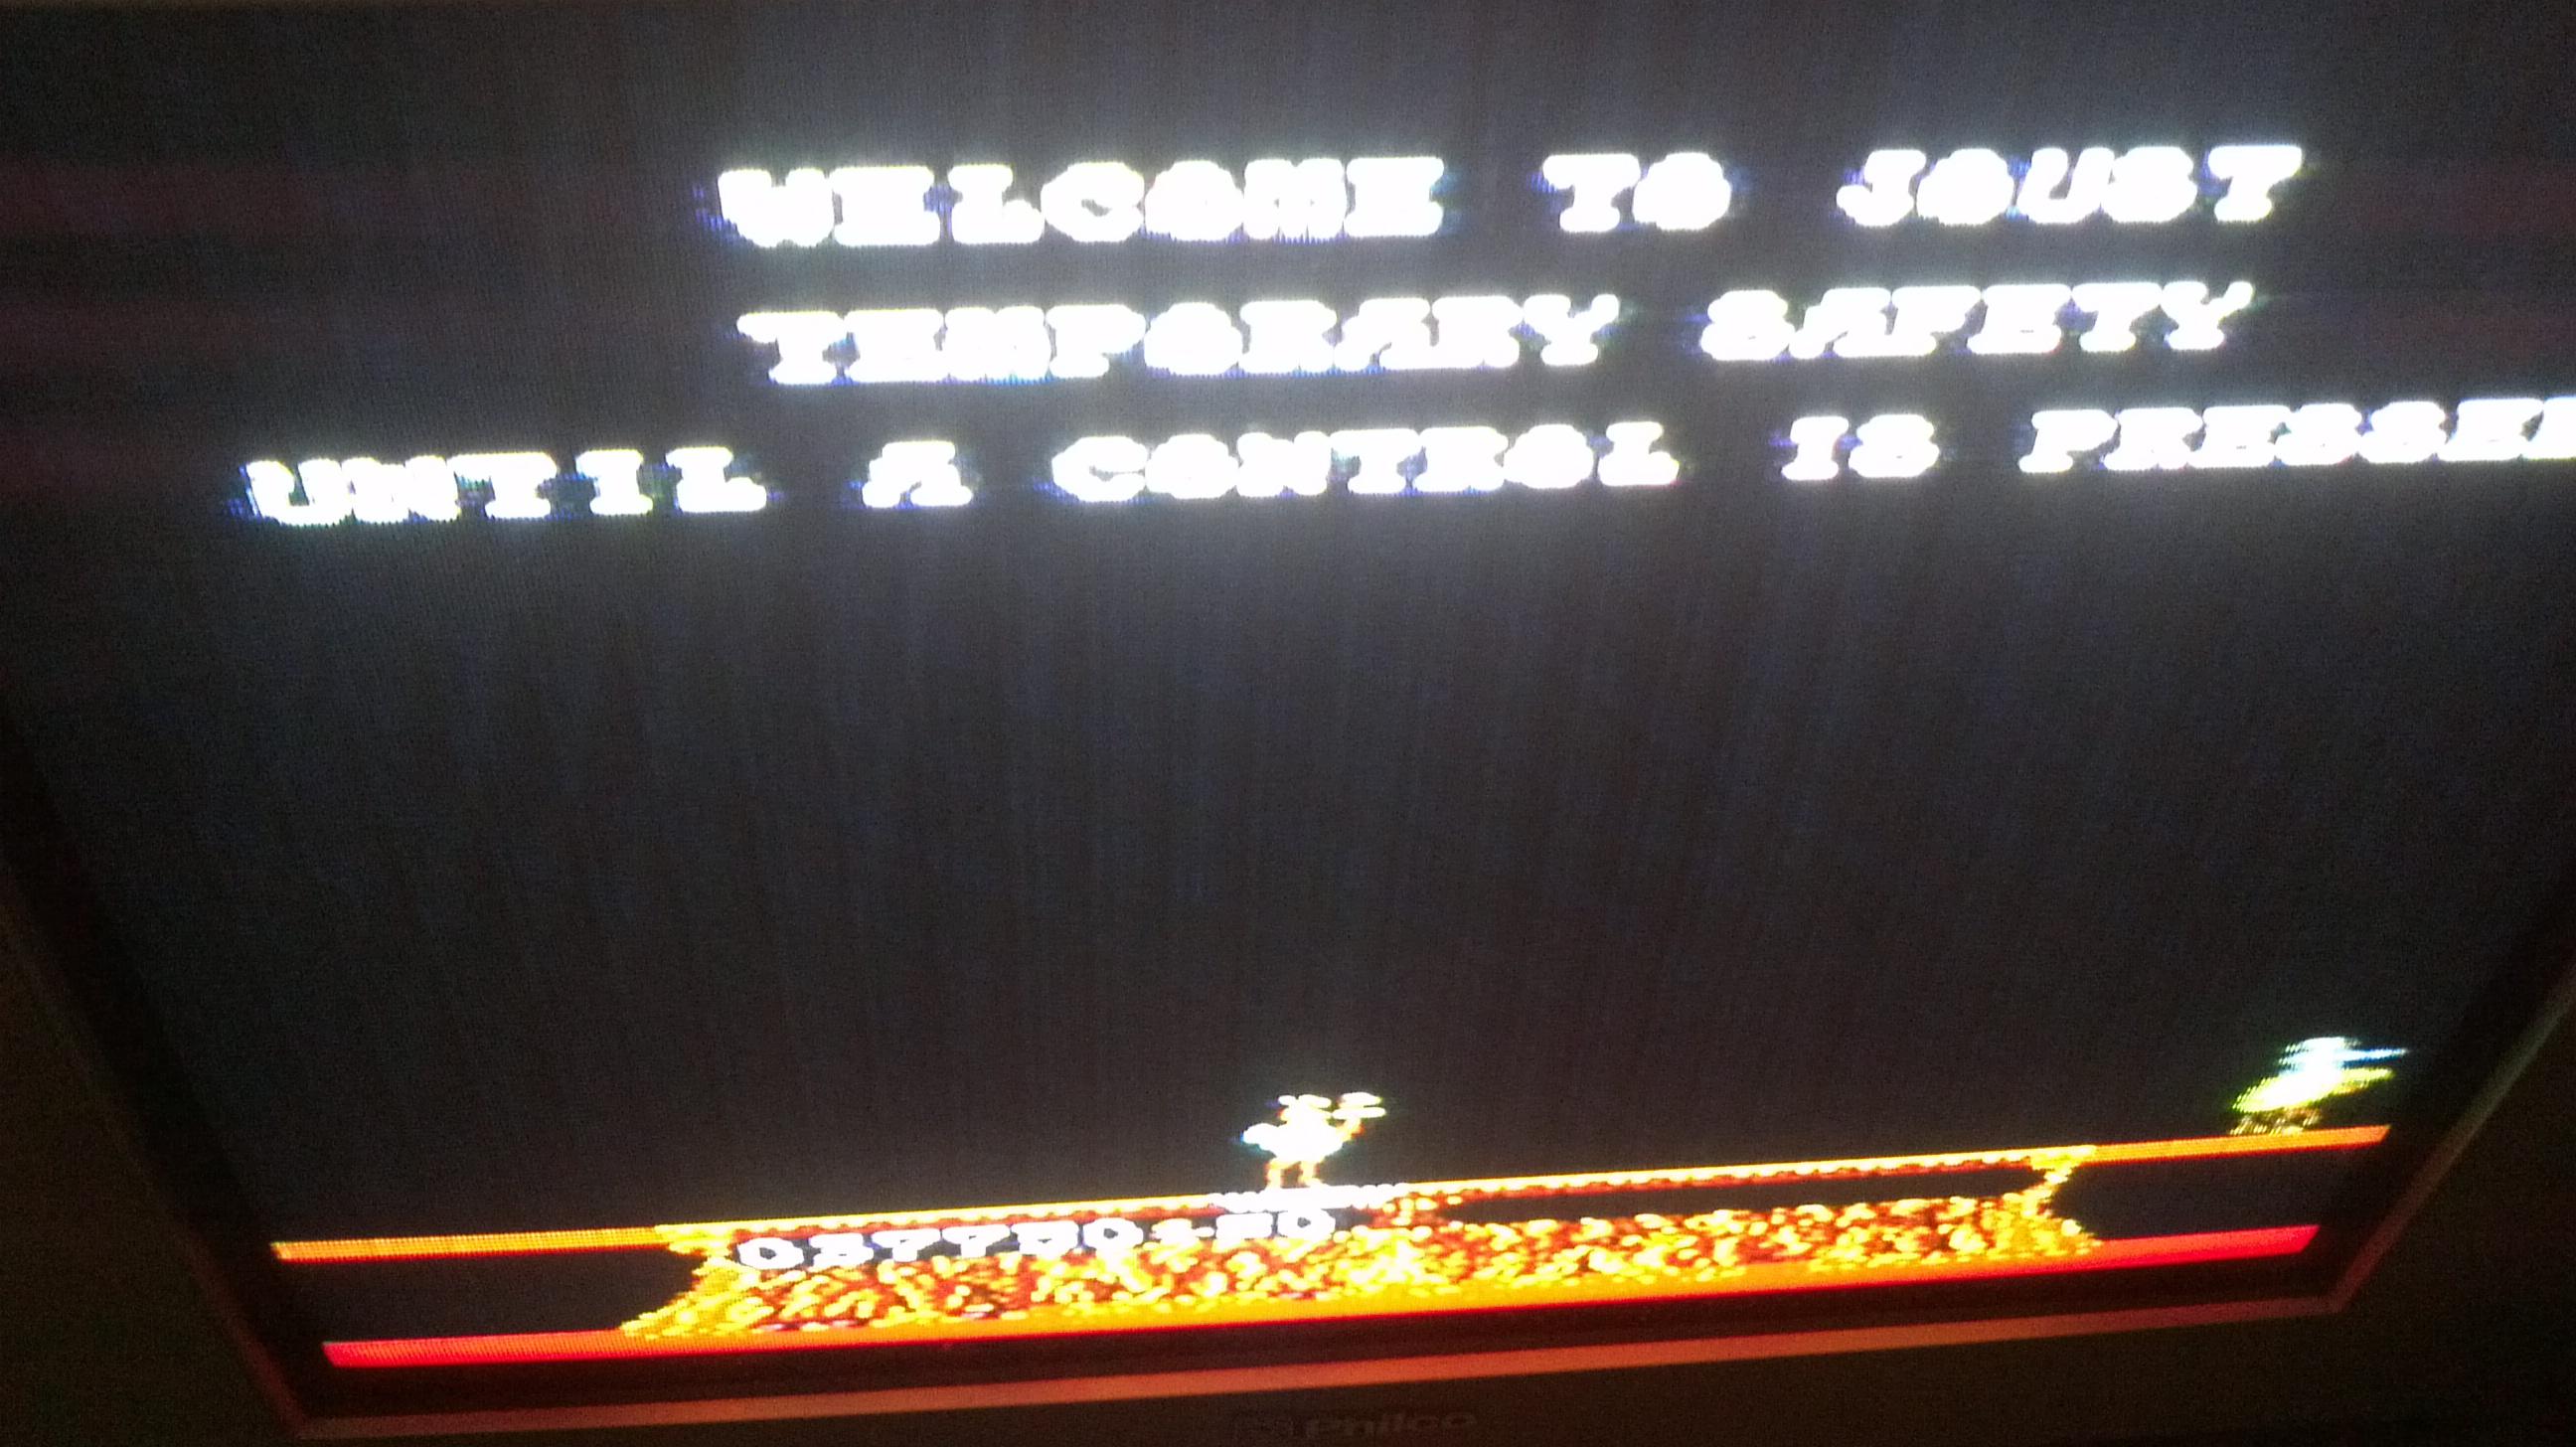 Liduario: Joust (NES/Famicom) 37,750 points on 2014-03-10 08:28:06